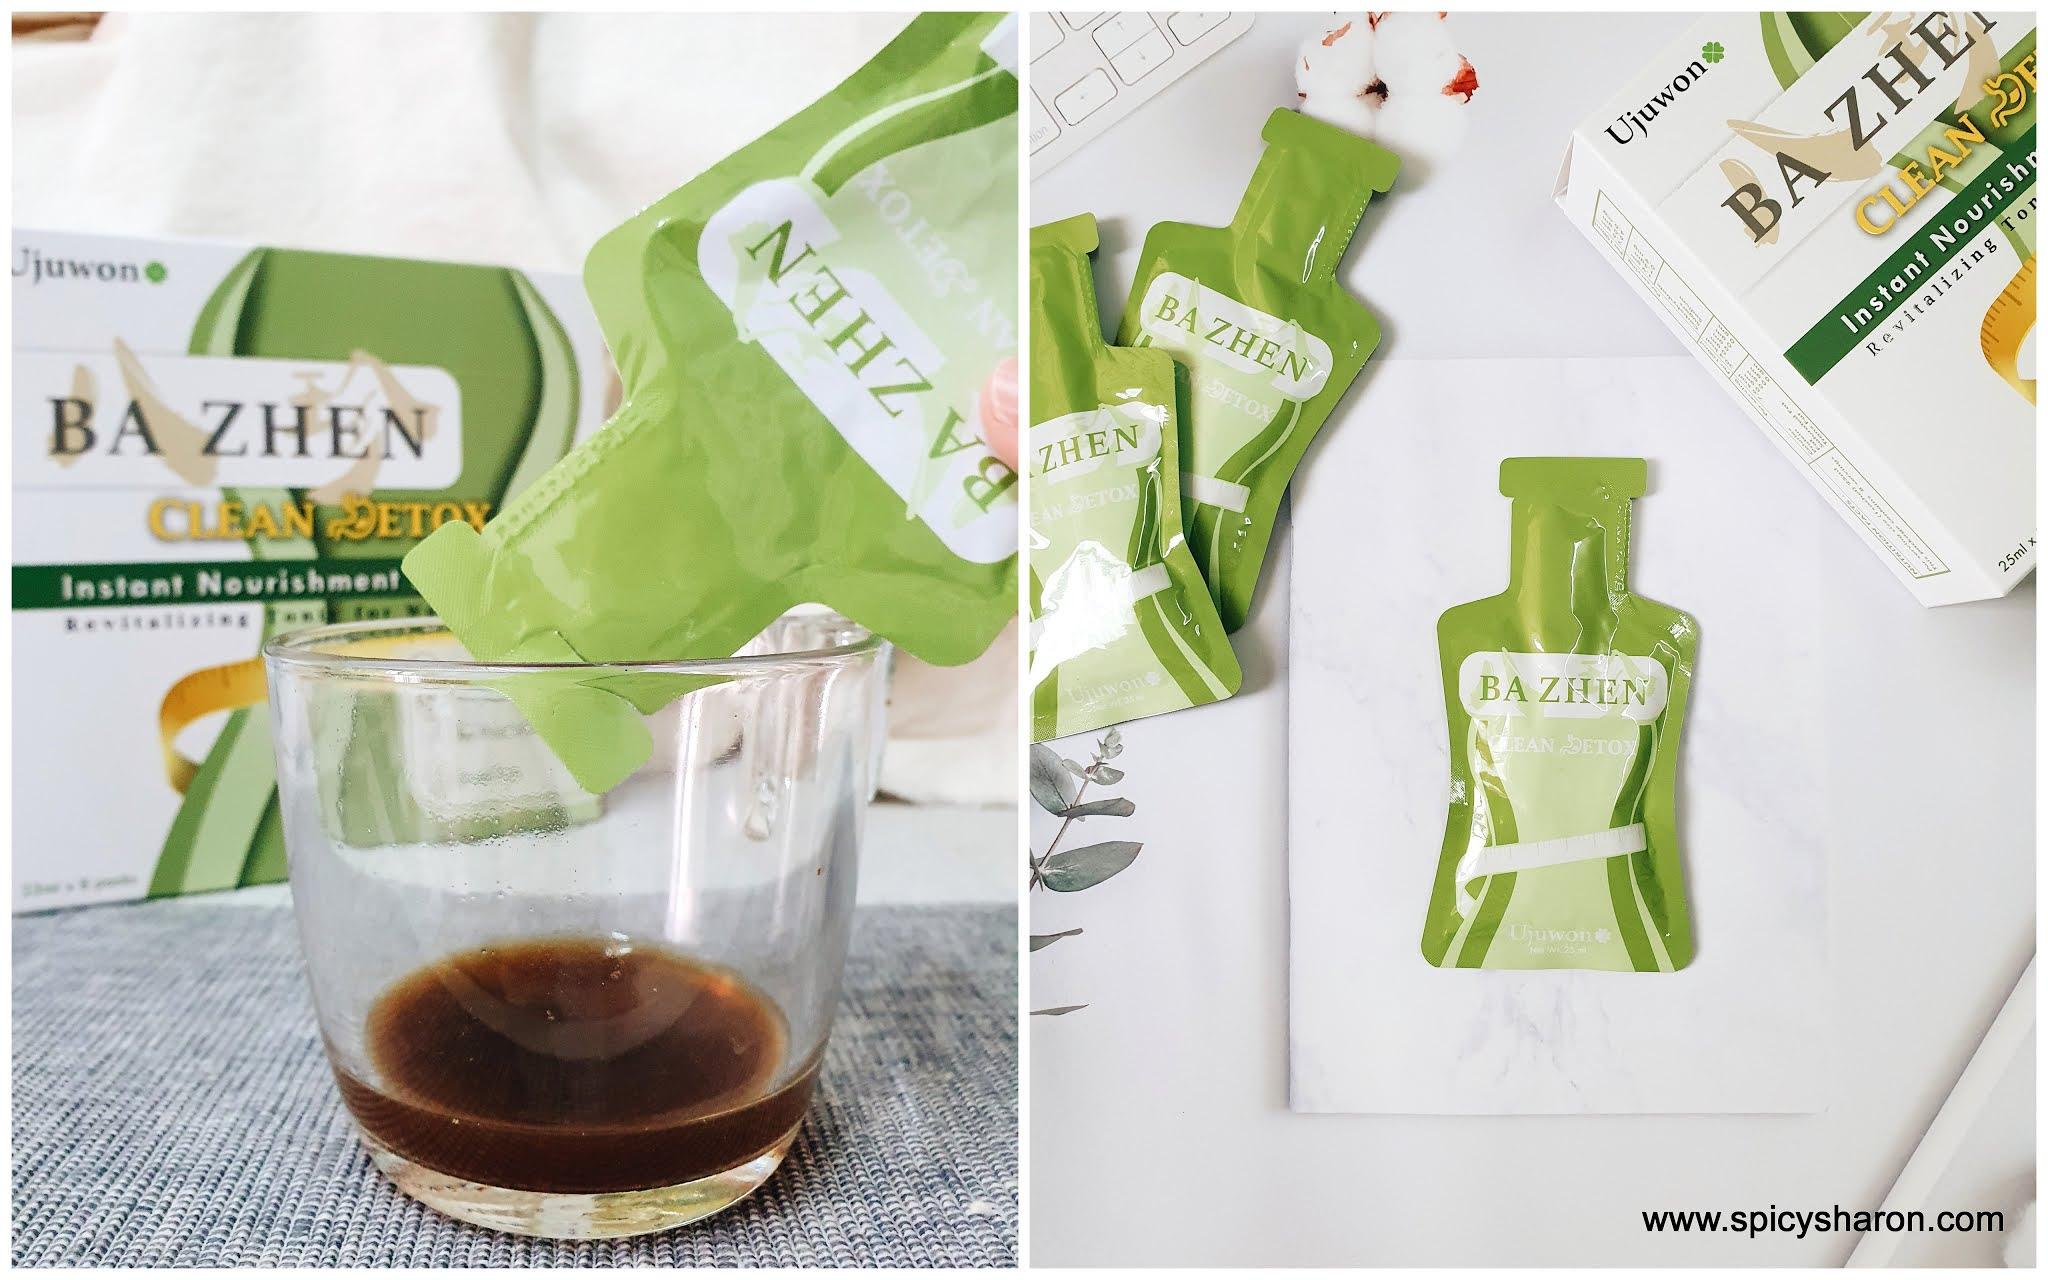 Product Review : Ujuwon Ba Zhen Clean Detox & Bust Up Instant Nourishment Drink